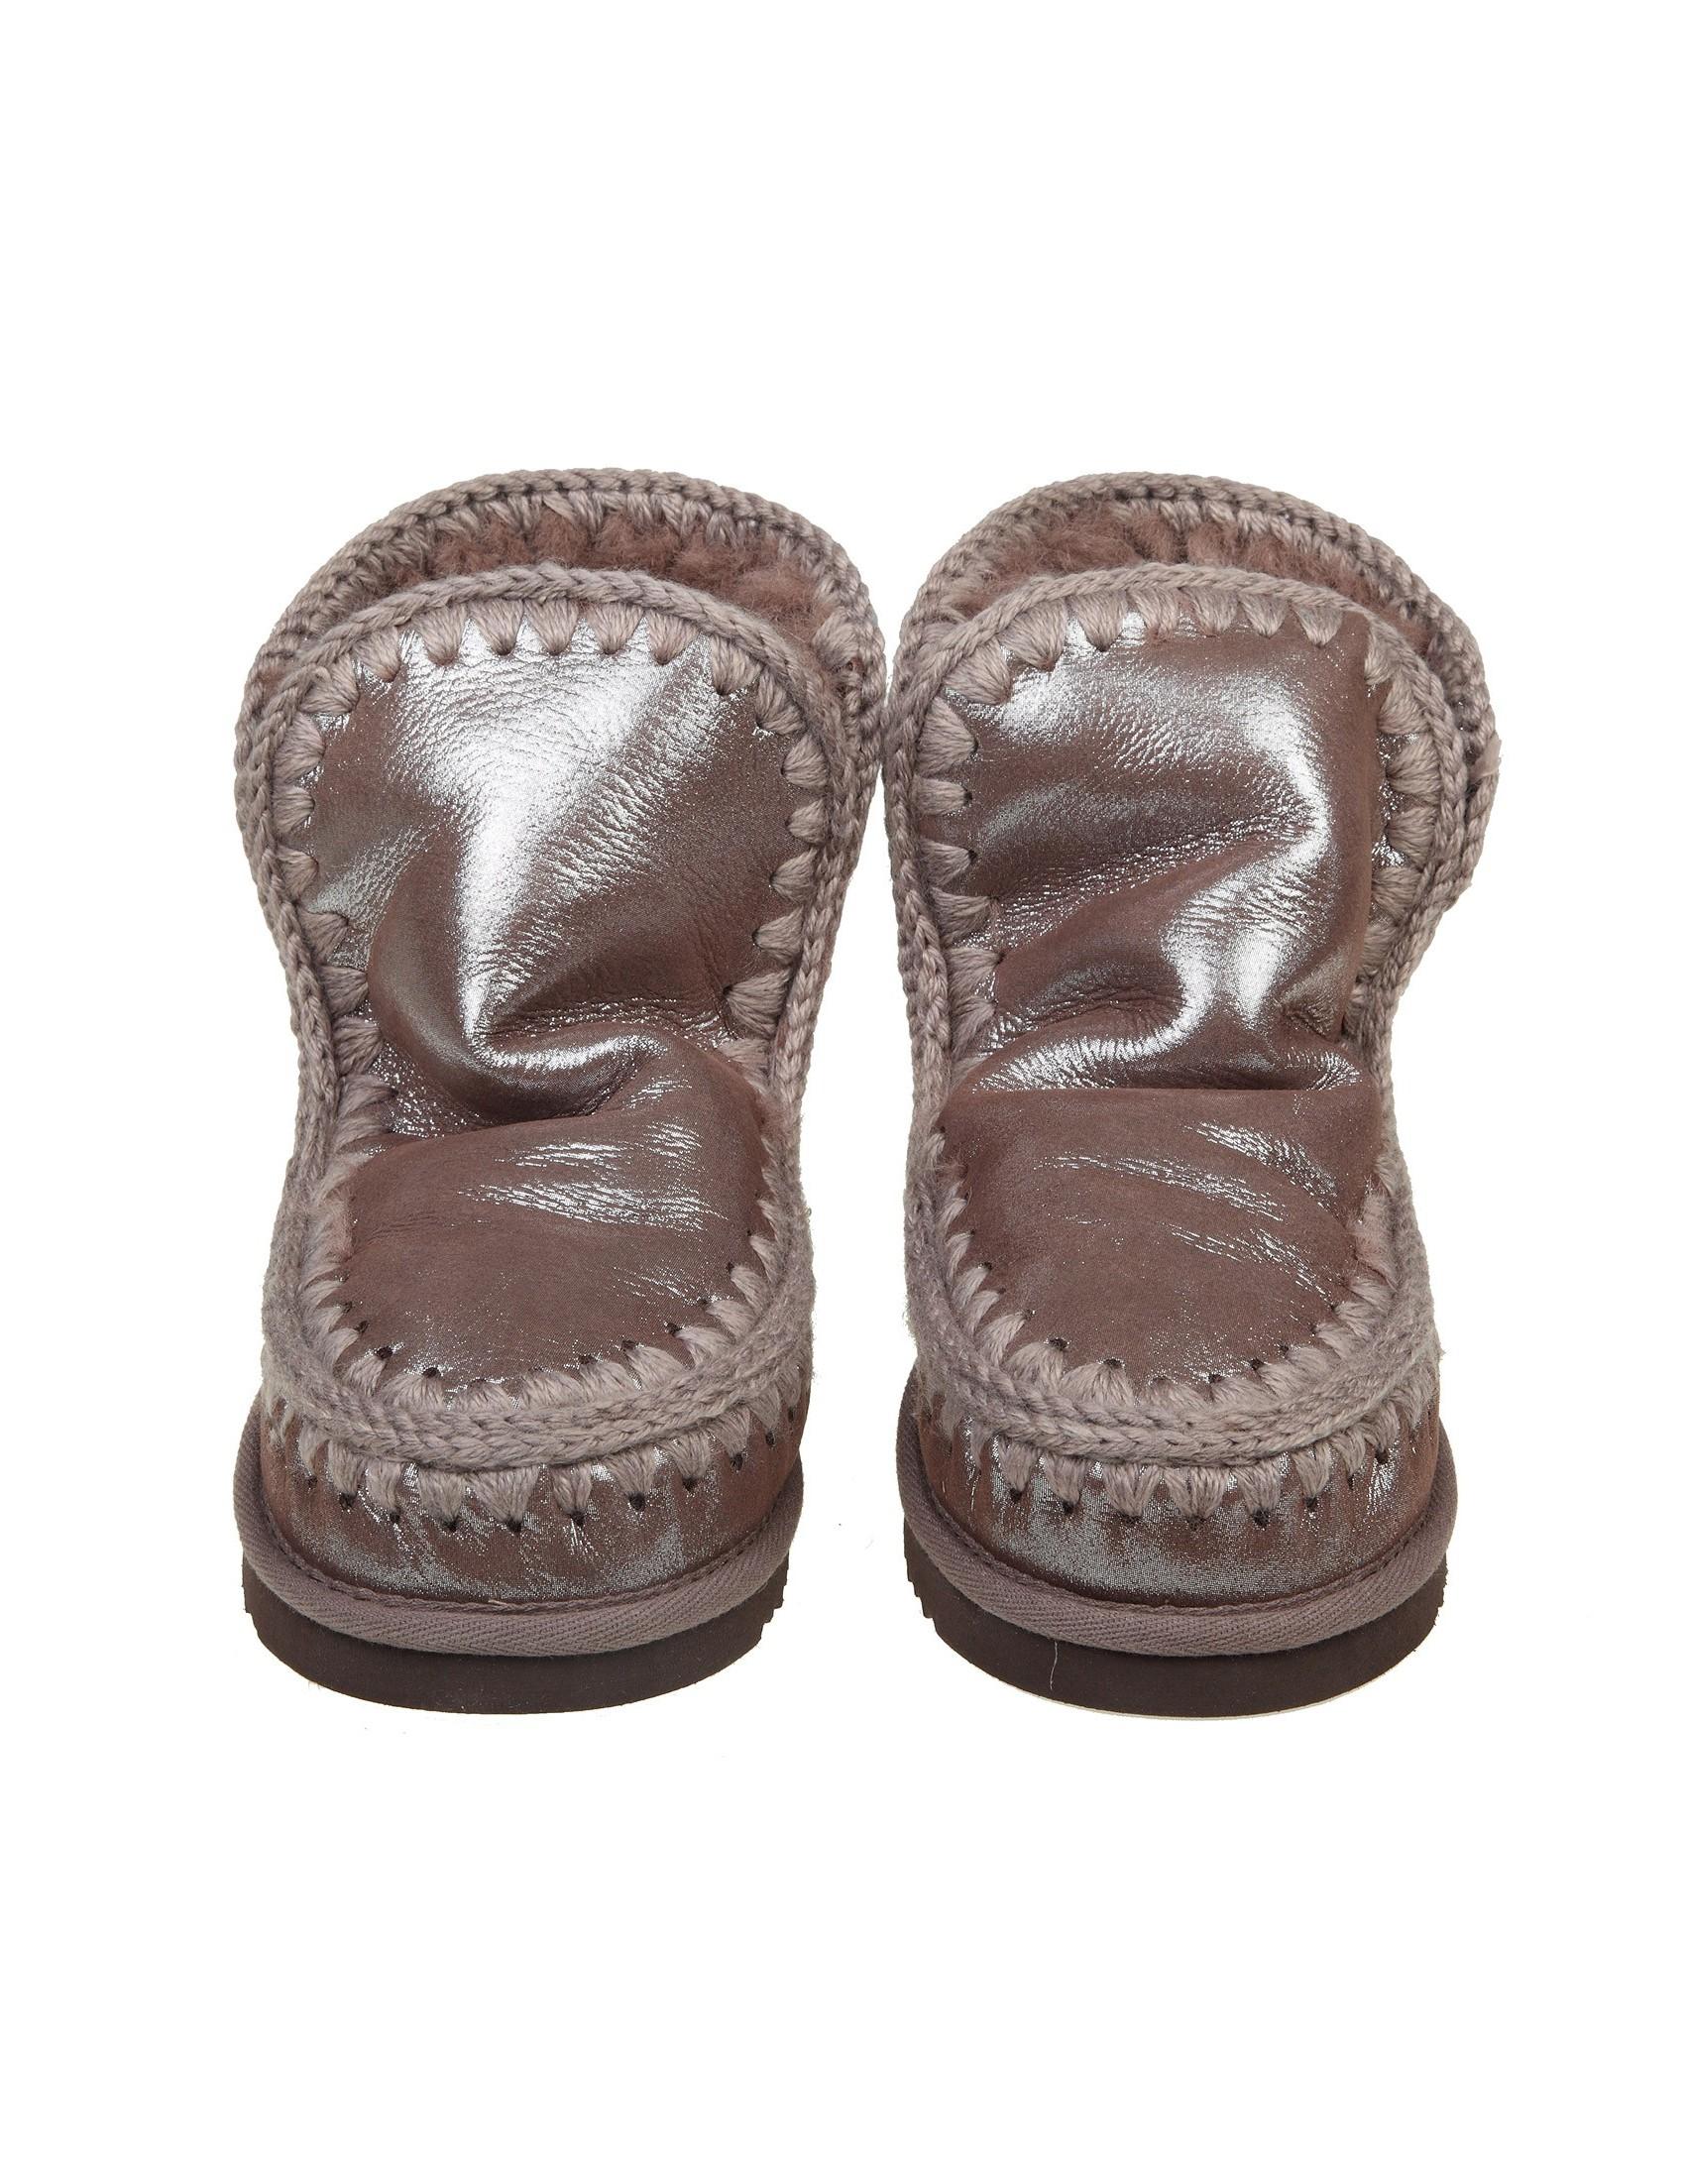 buy popular 9a530 7c81d mou-eskimo-18-metallic-shearling-boots-color-brown.jpg